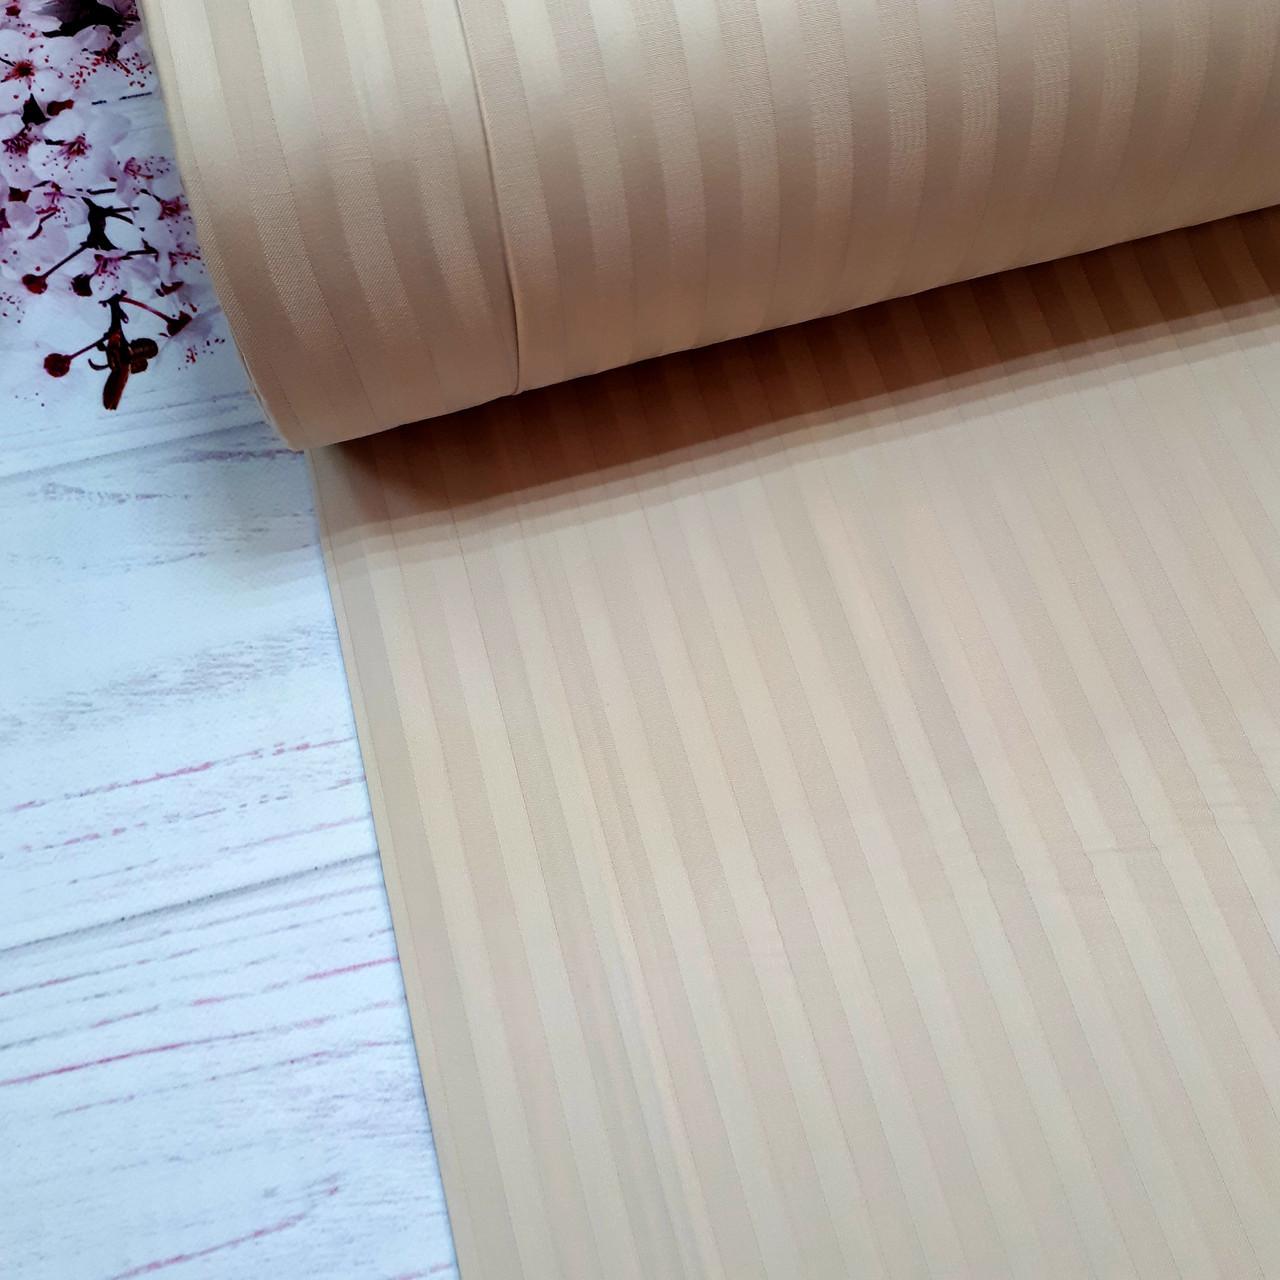 Сатин 100% хлопок  (ТУРЦИЯ шир. 2,4 м) Stripes светло- бежевый ОТРЕЗ( 1,8*2,4)